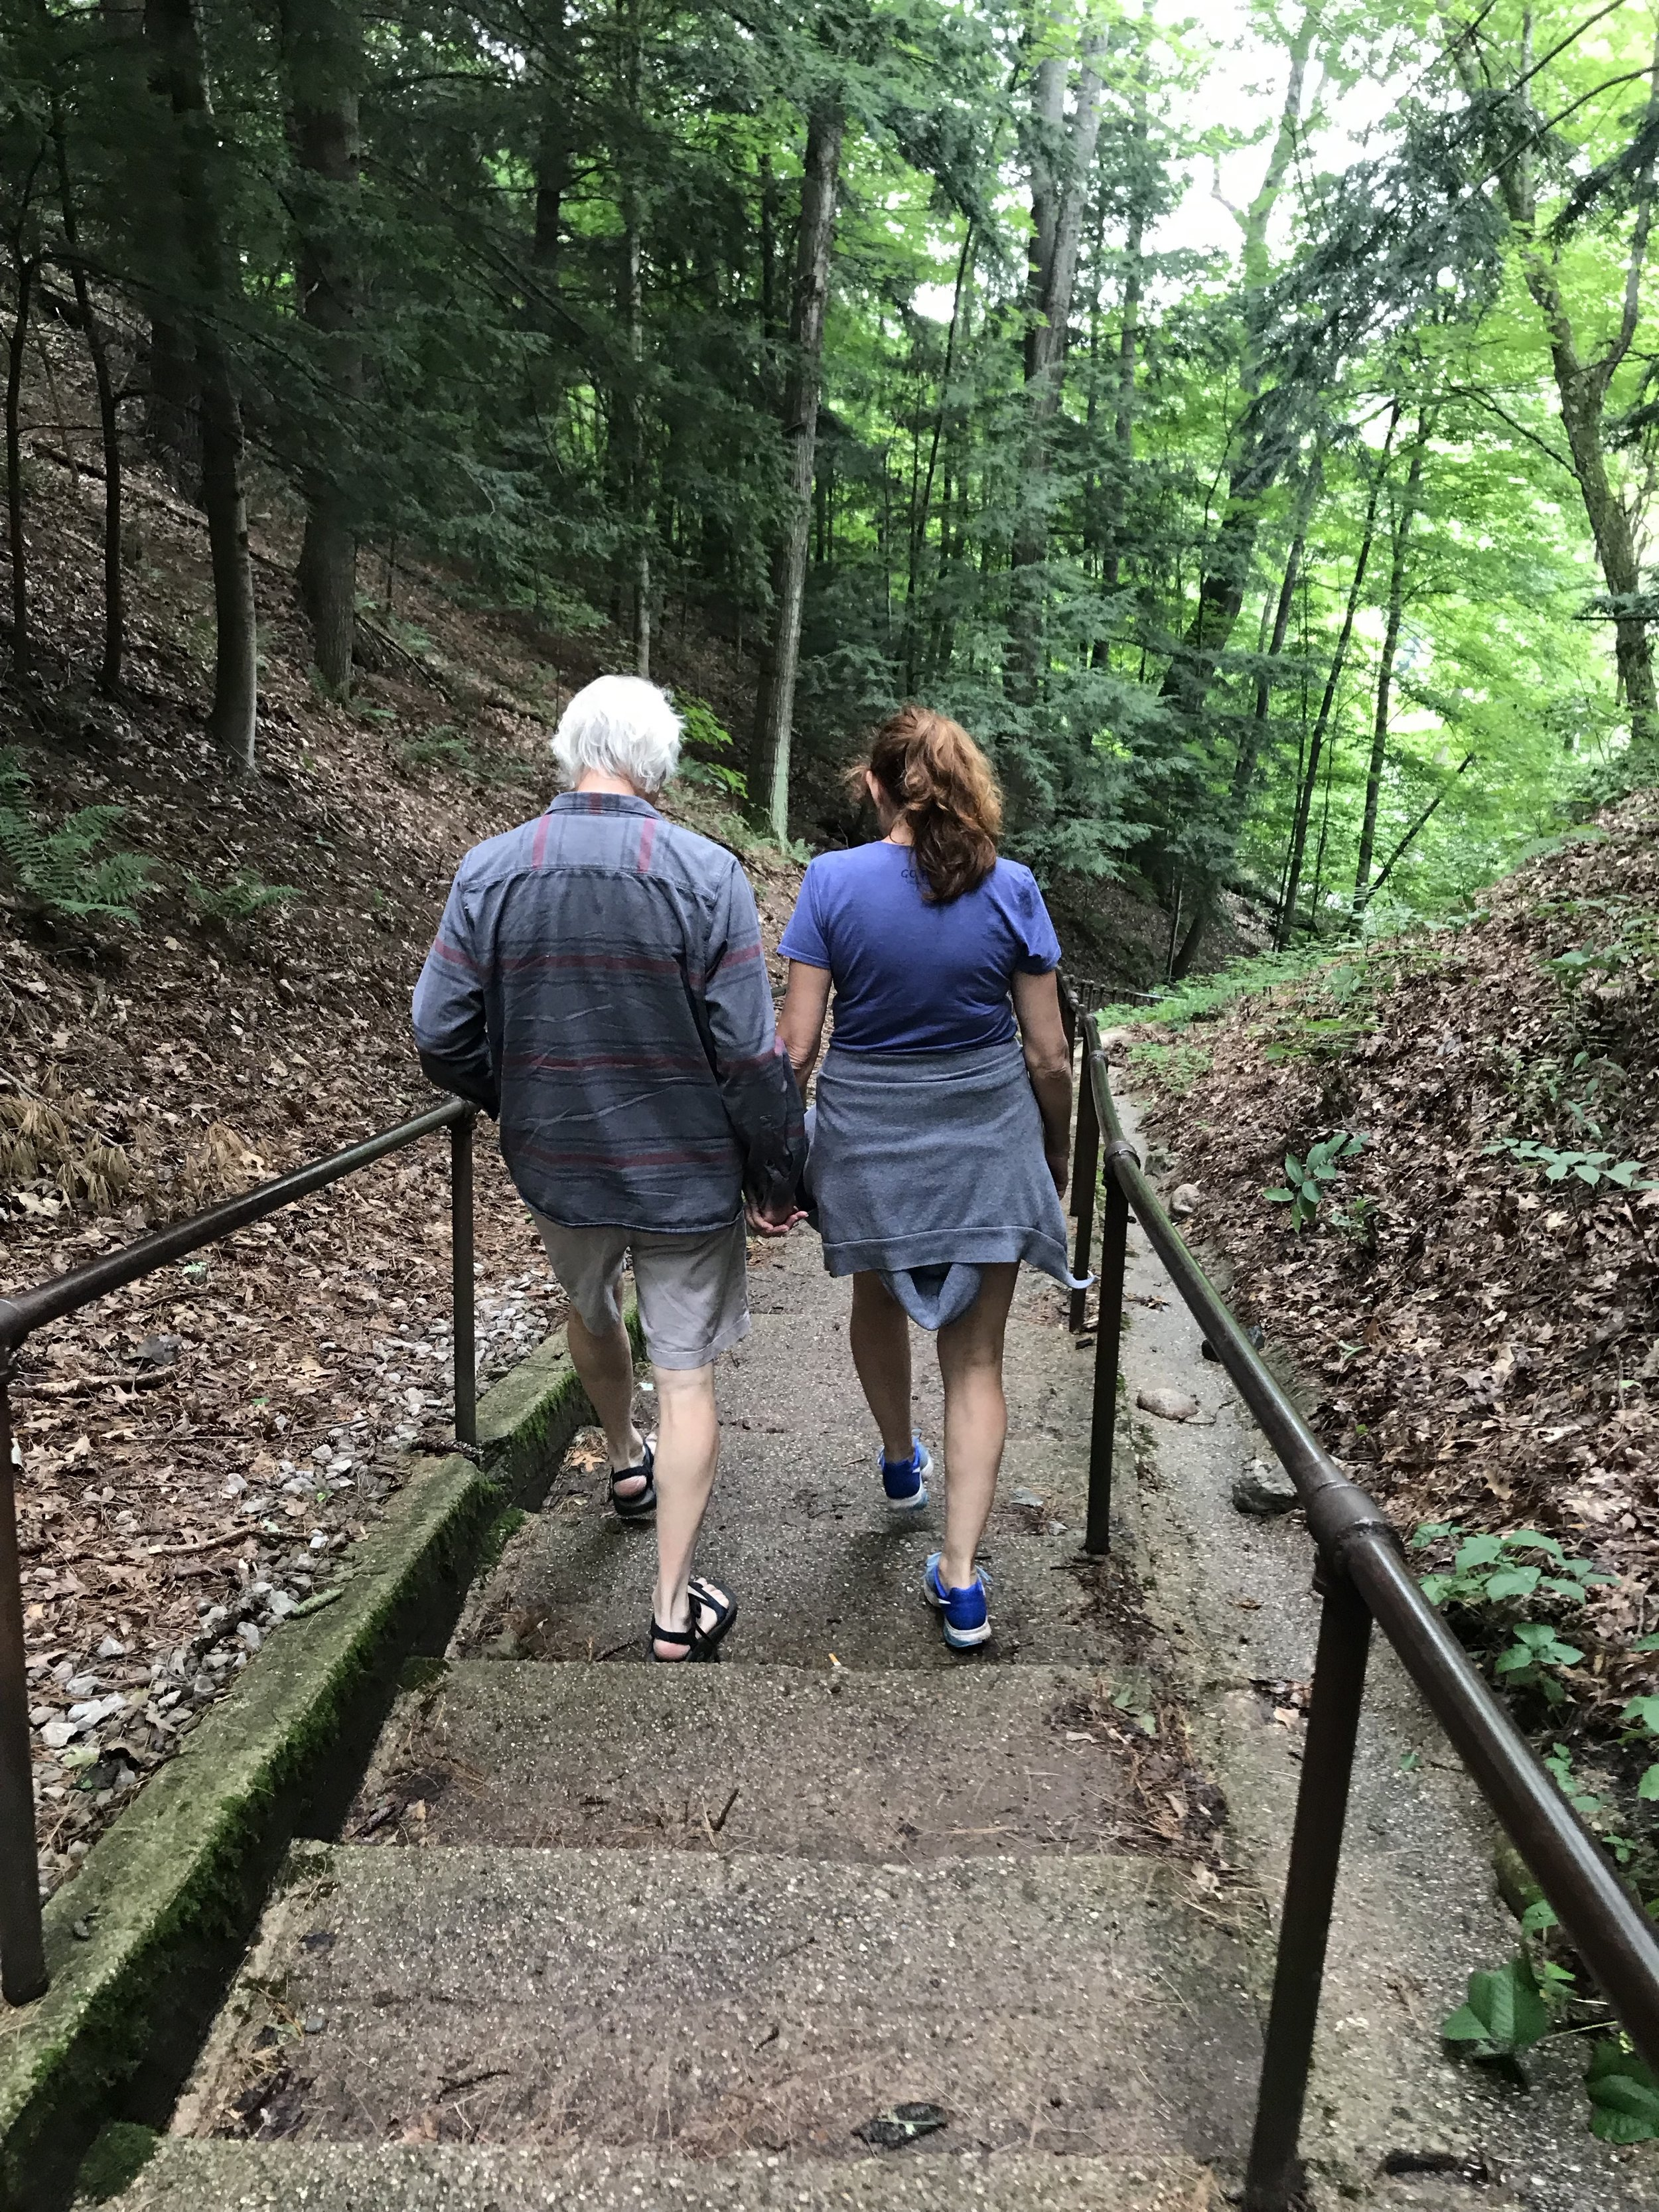 Binnie and Bill on a short hike at Tippy Dam in Wellston Michigan.